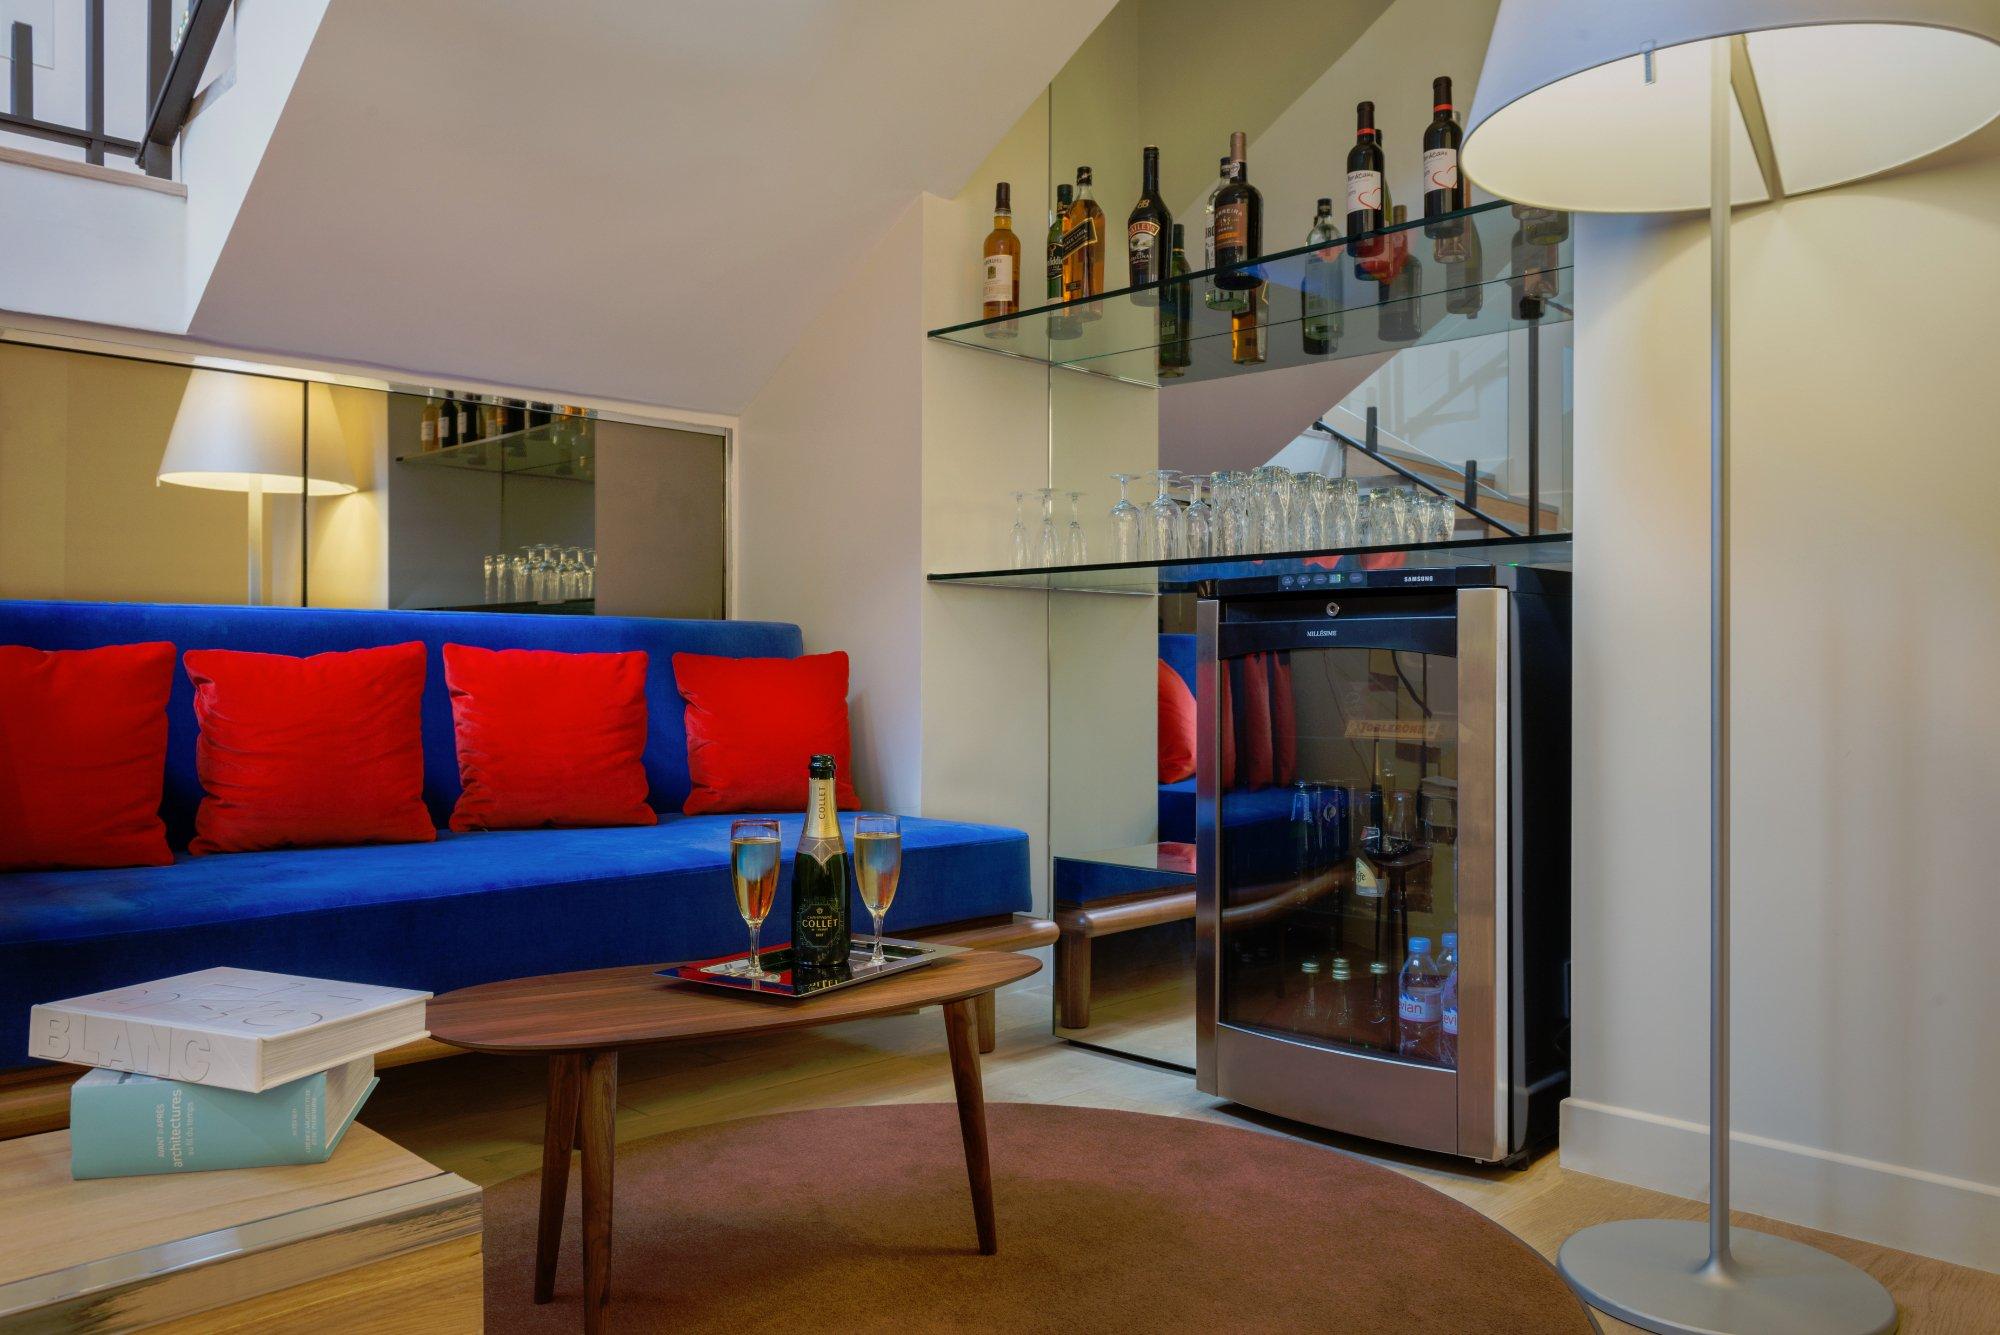 Best western jardin de cluny hotel parigi le de france for Best western jardin de cluny hotel paris